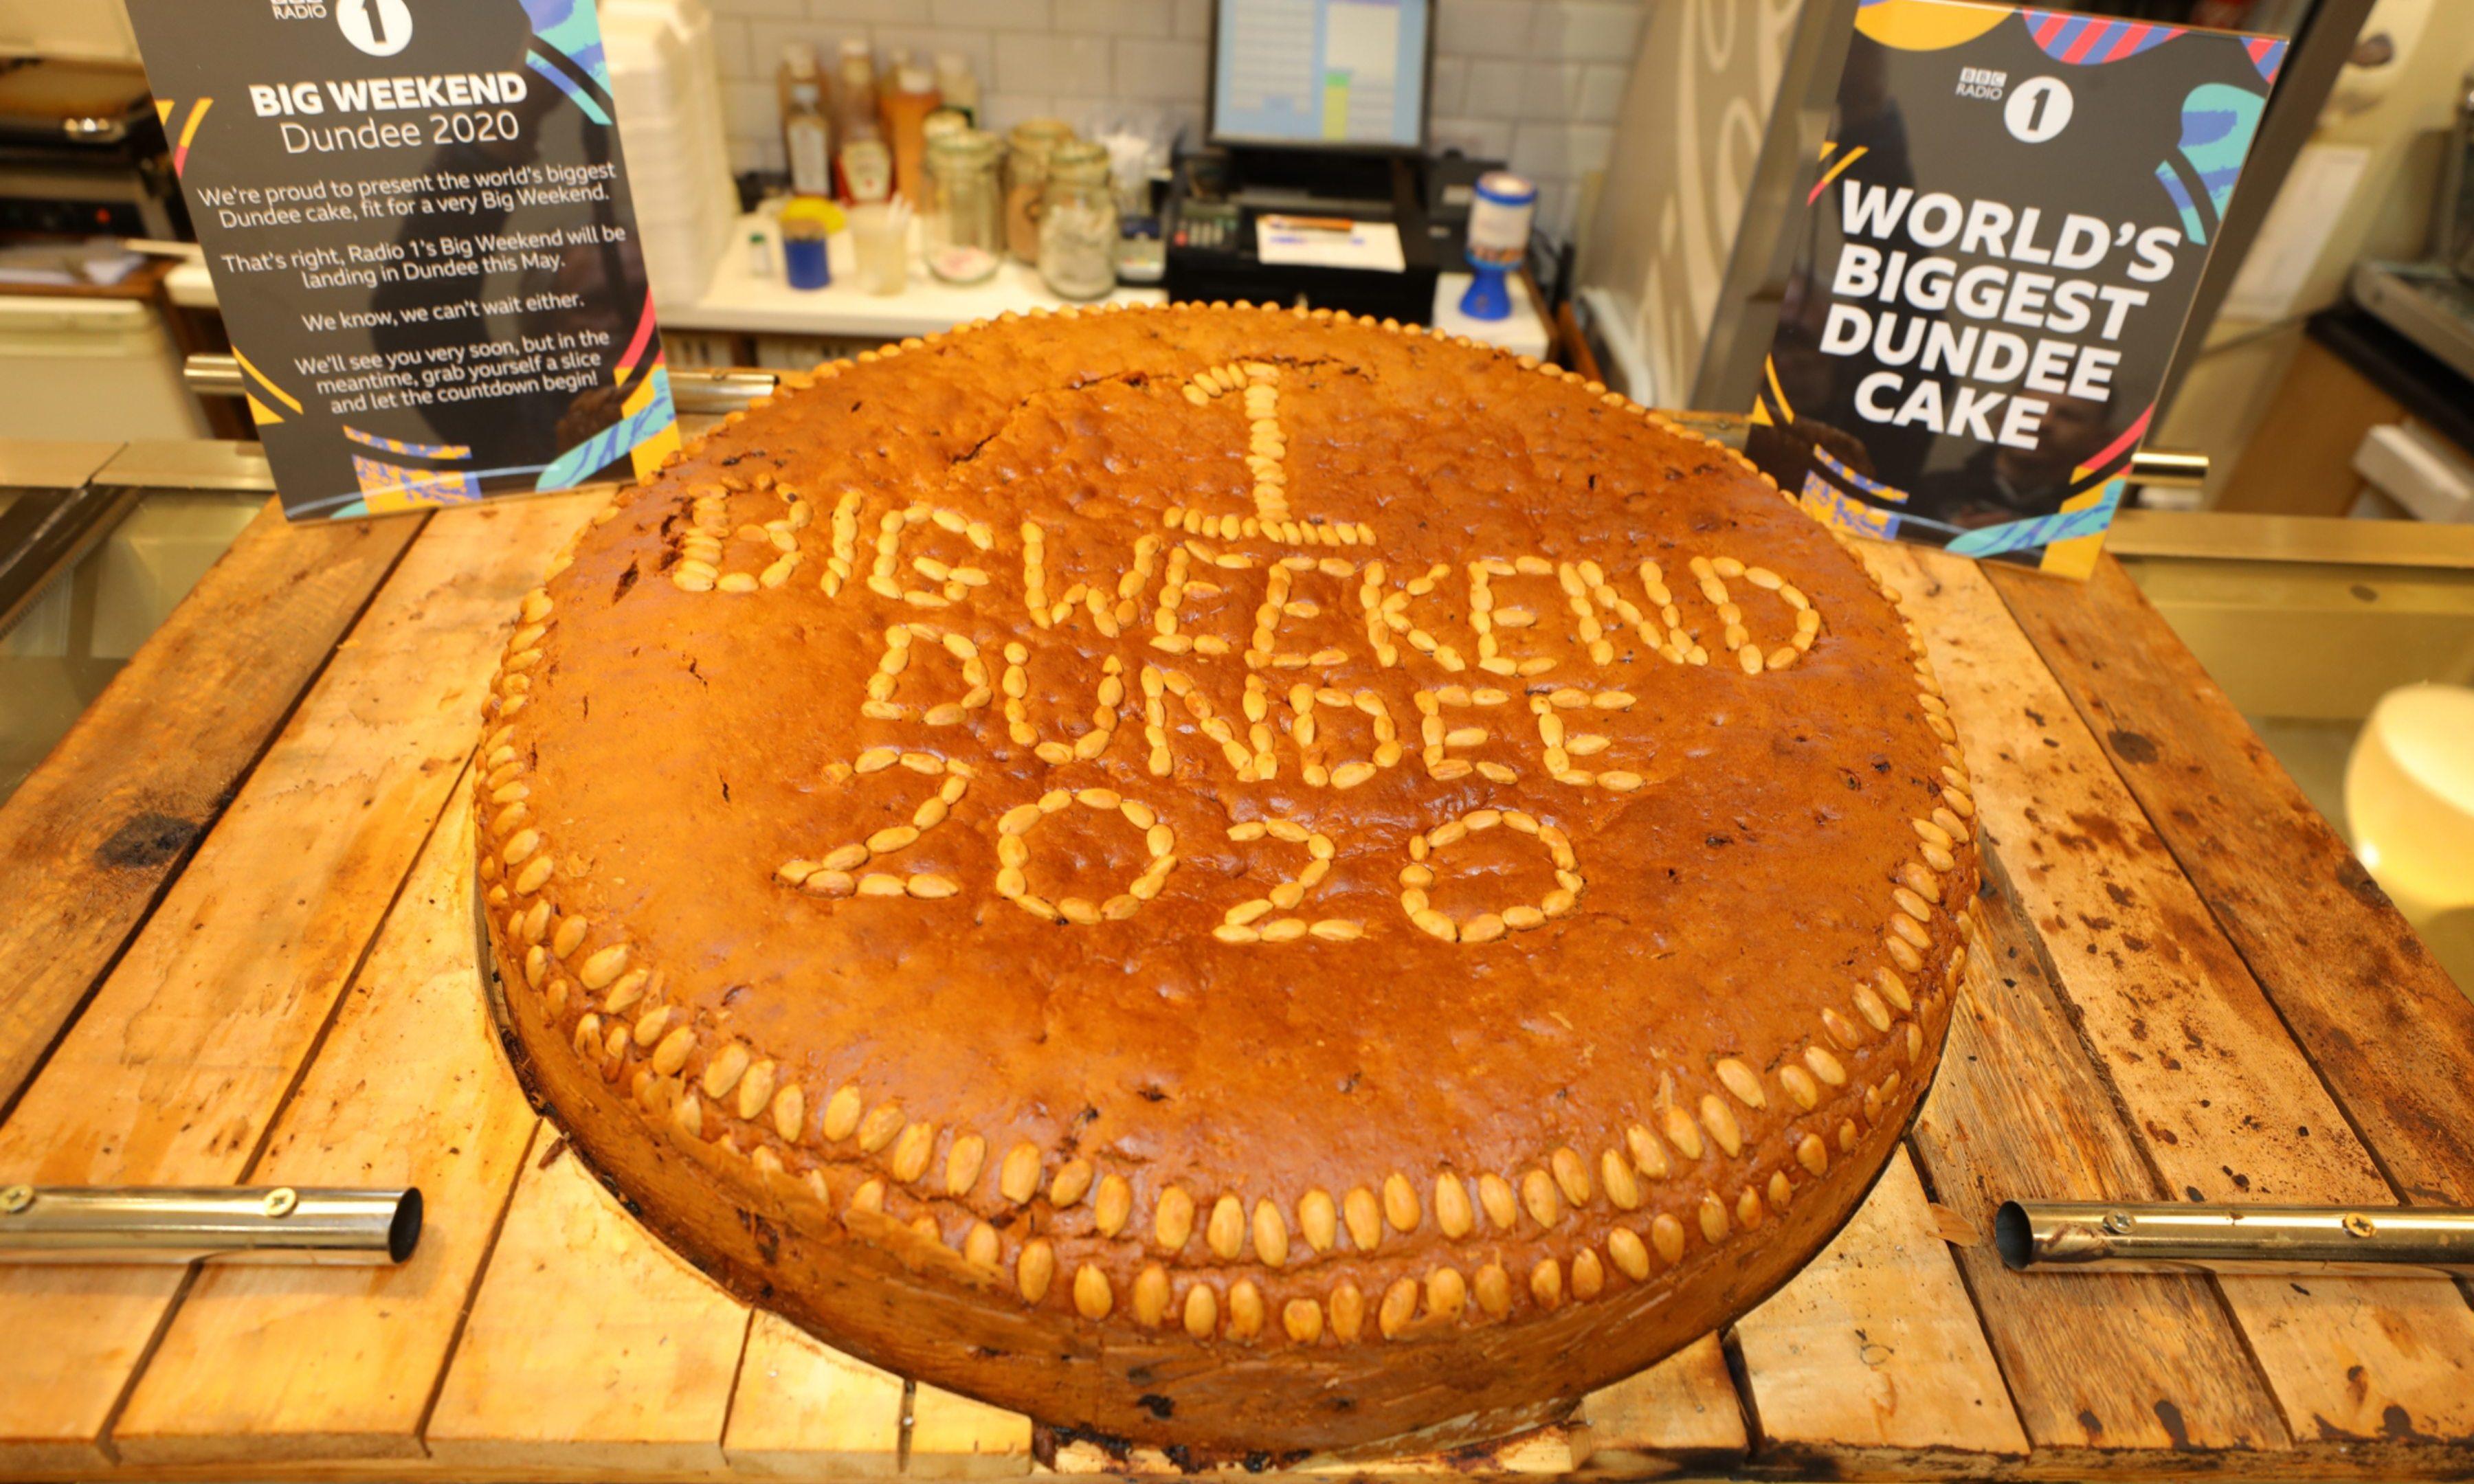 Clark's Big Weekend Dundee Cake.